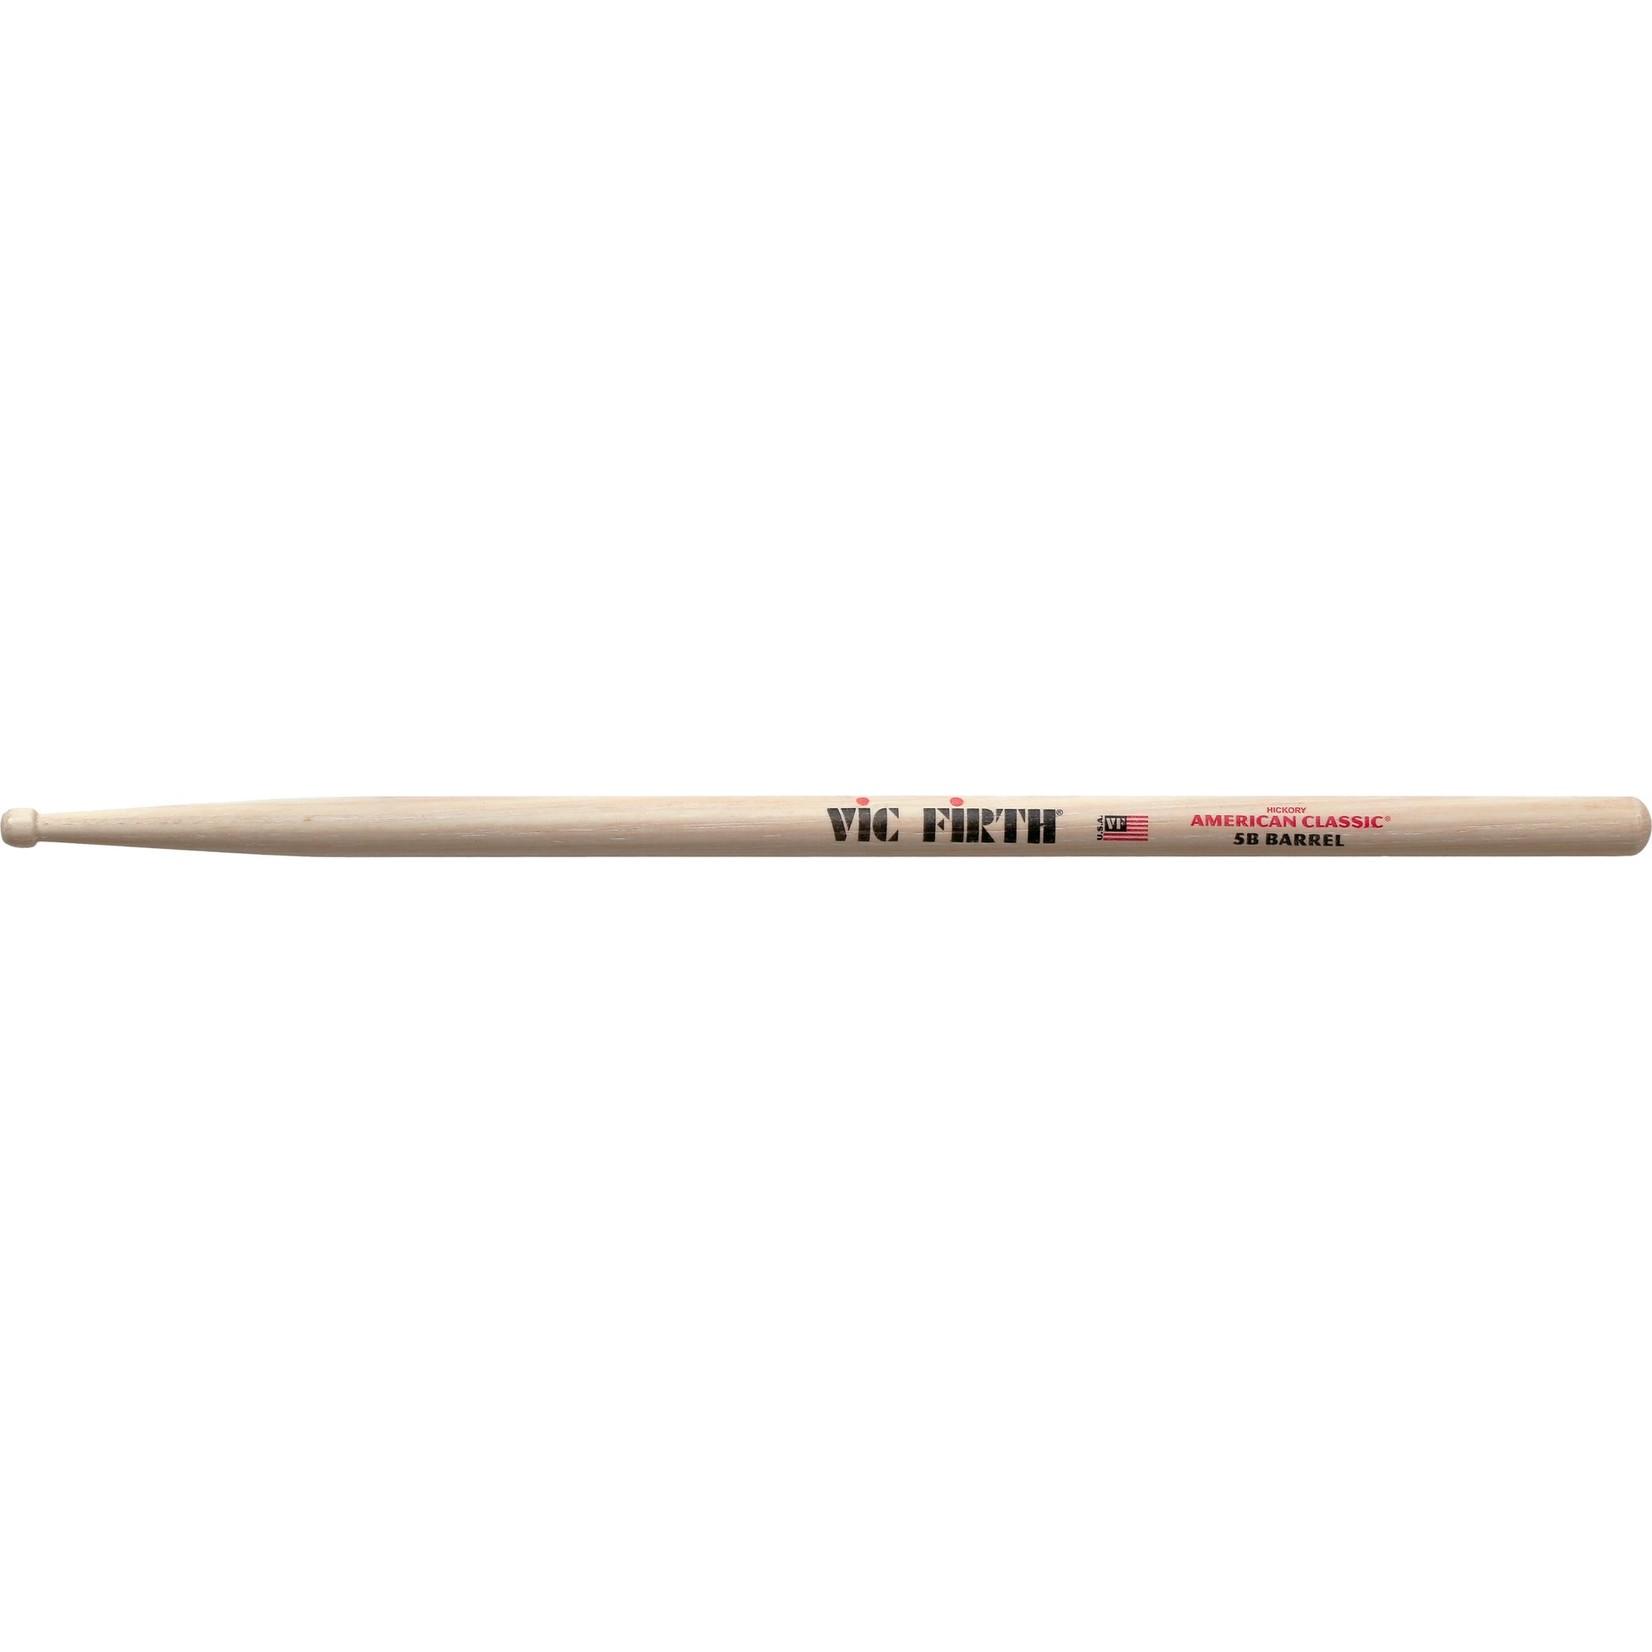 Vic Firth Vic Firth American Classic® 5B w/ Barrel Tip